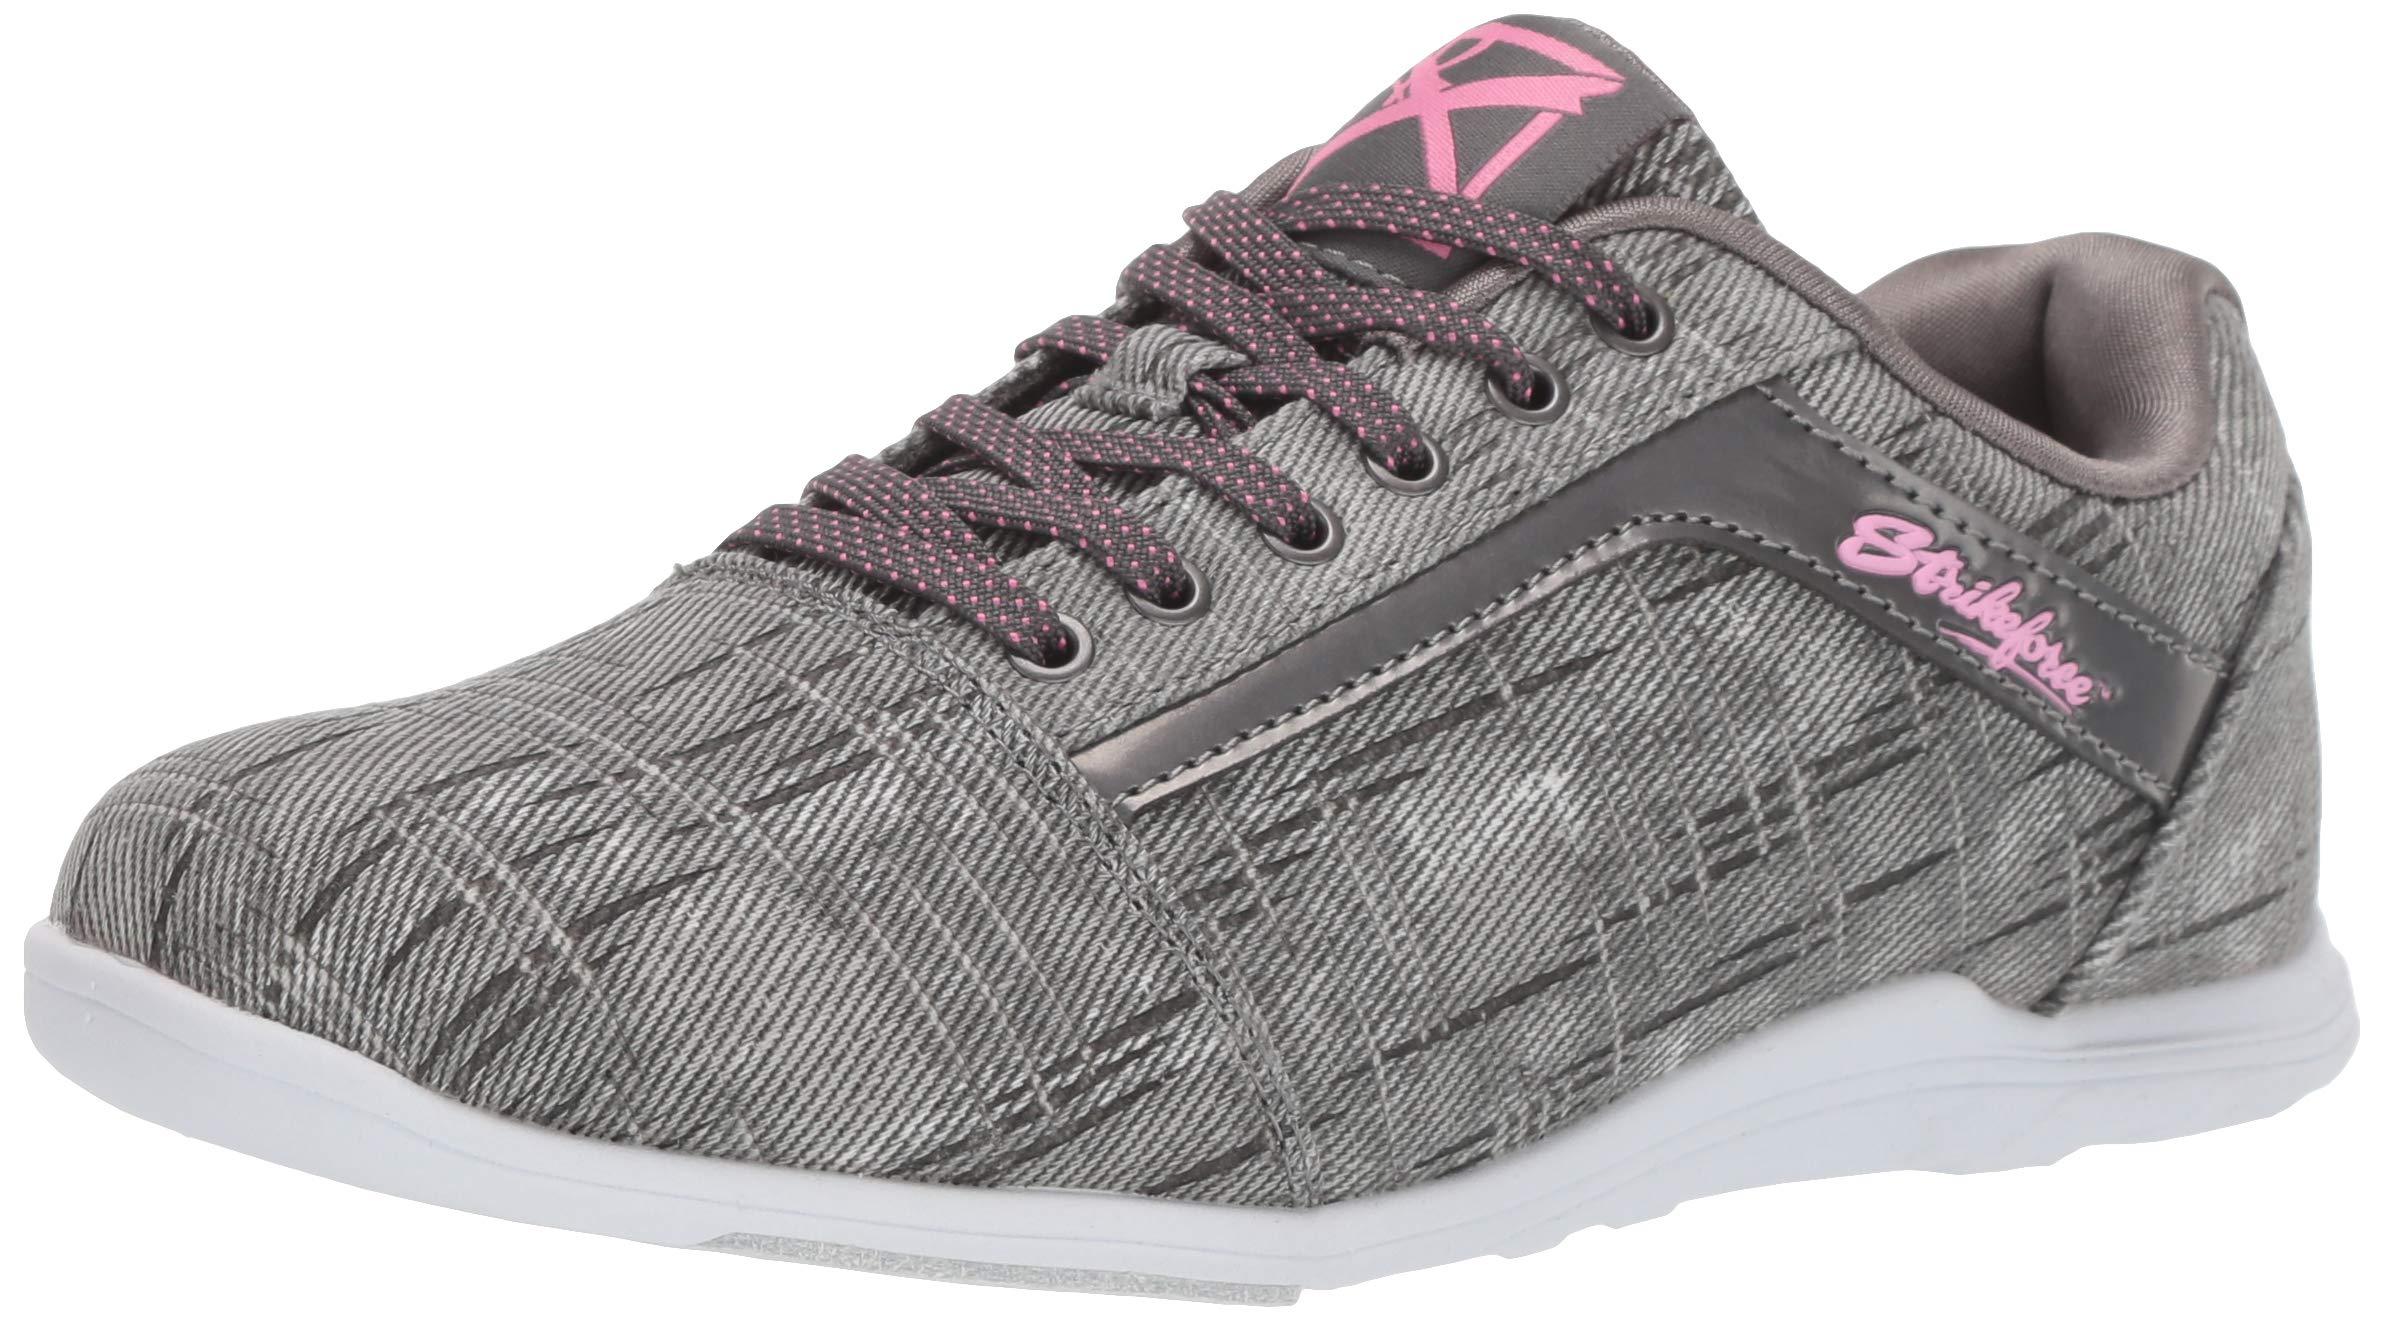 KR Strikeforce Womens Nova Lite Bowling Shoes- Ash/Hot Pink (9 M US, Ash/Hot Pink) by KR